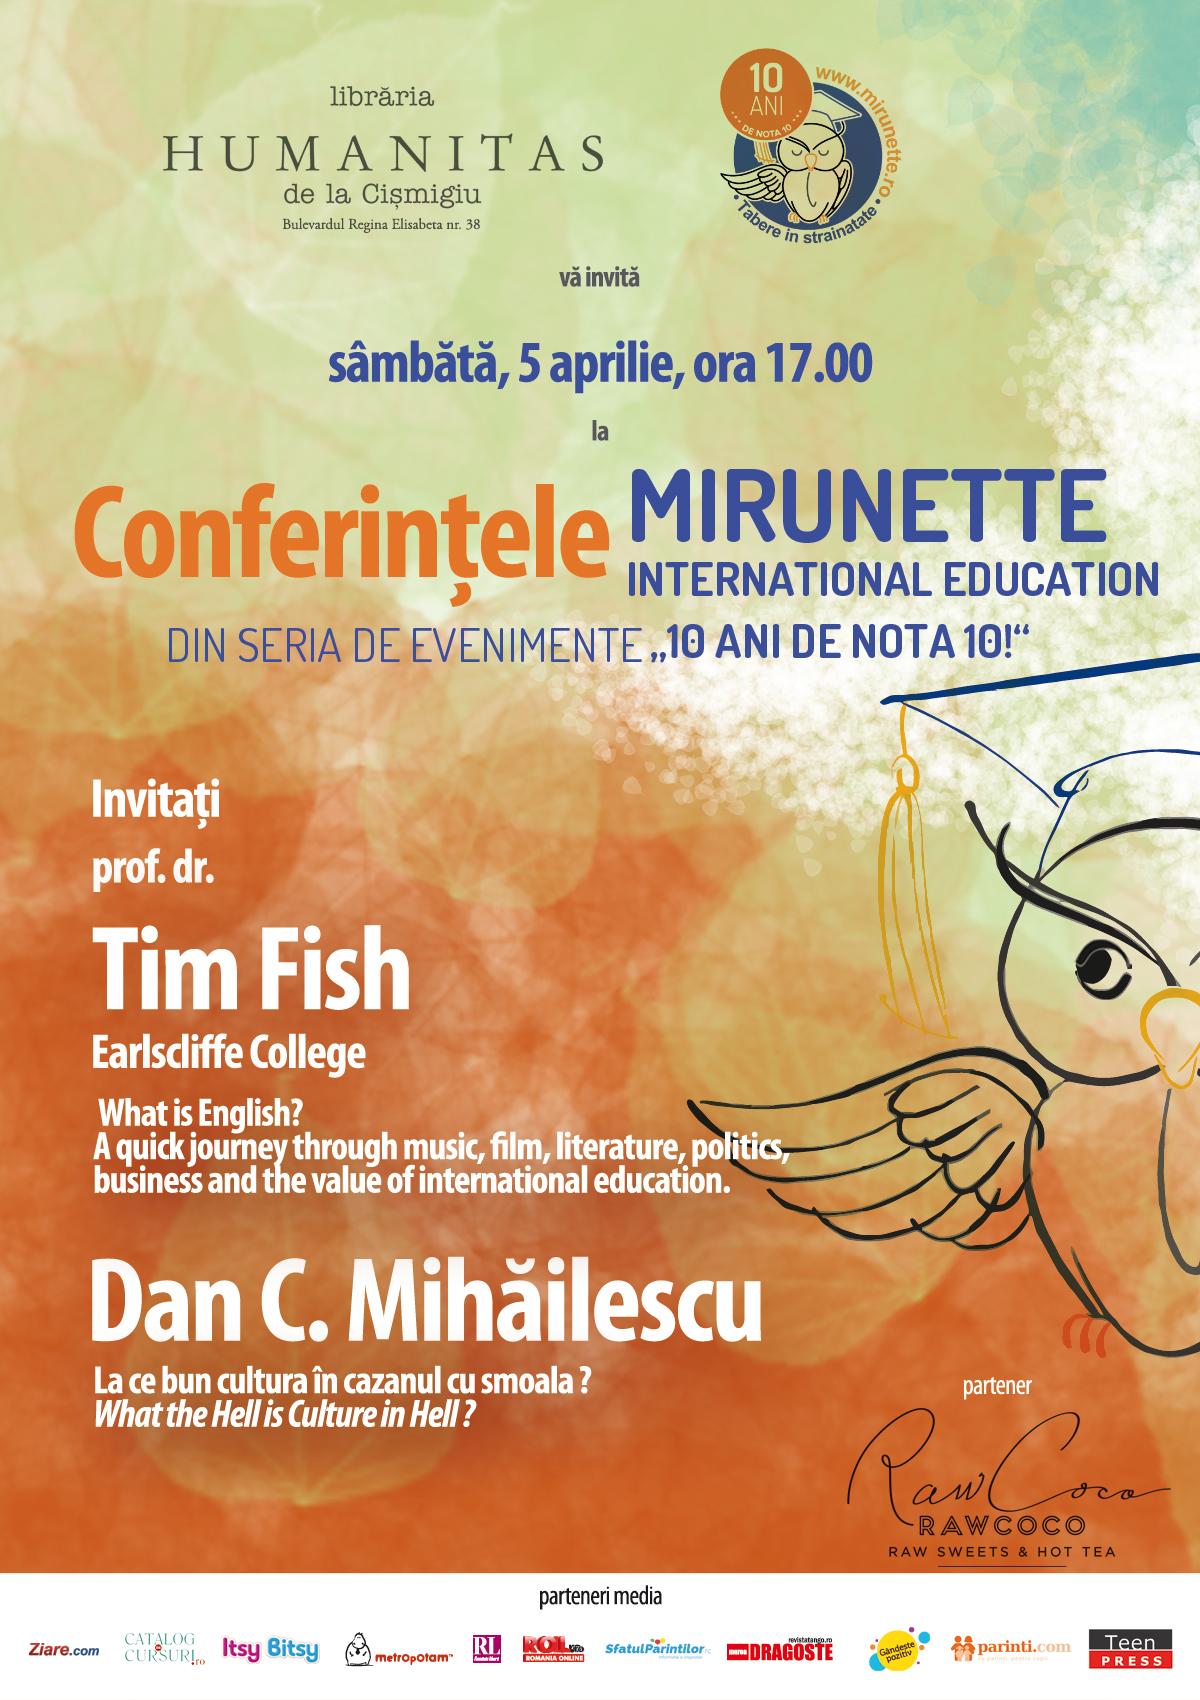 Img. Com. Mirunette-Humanitas